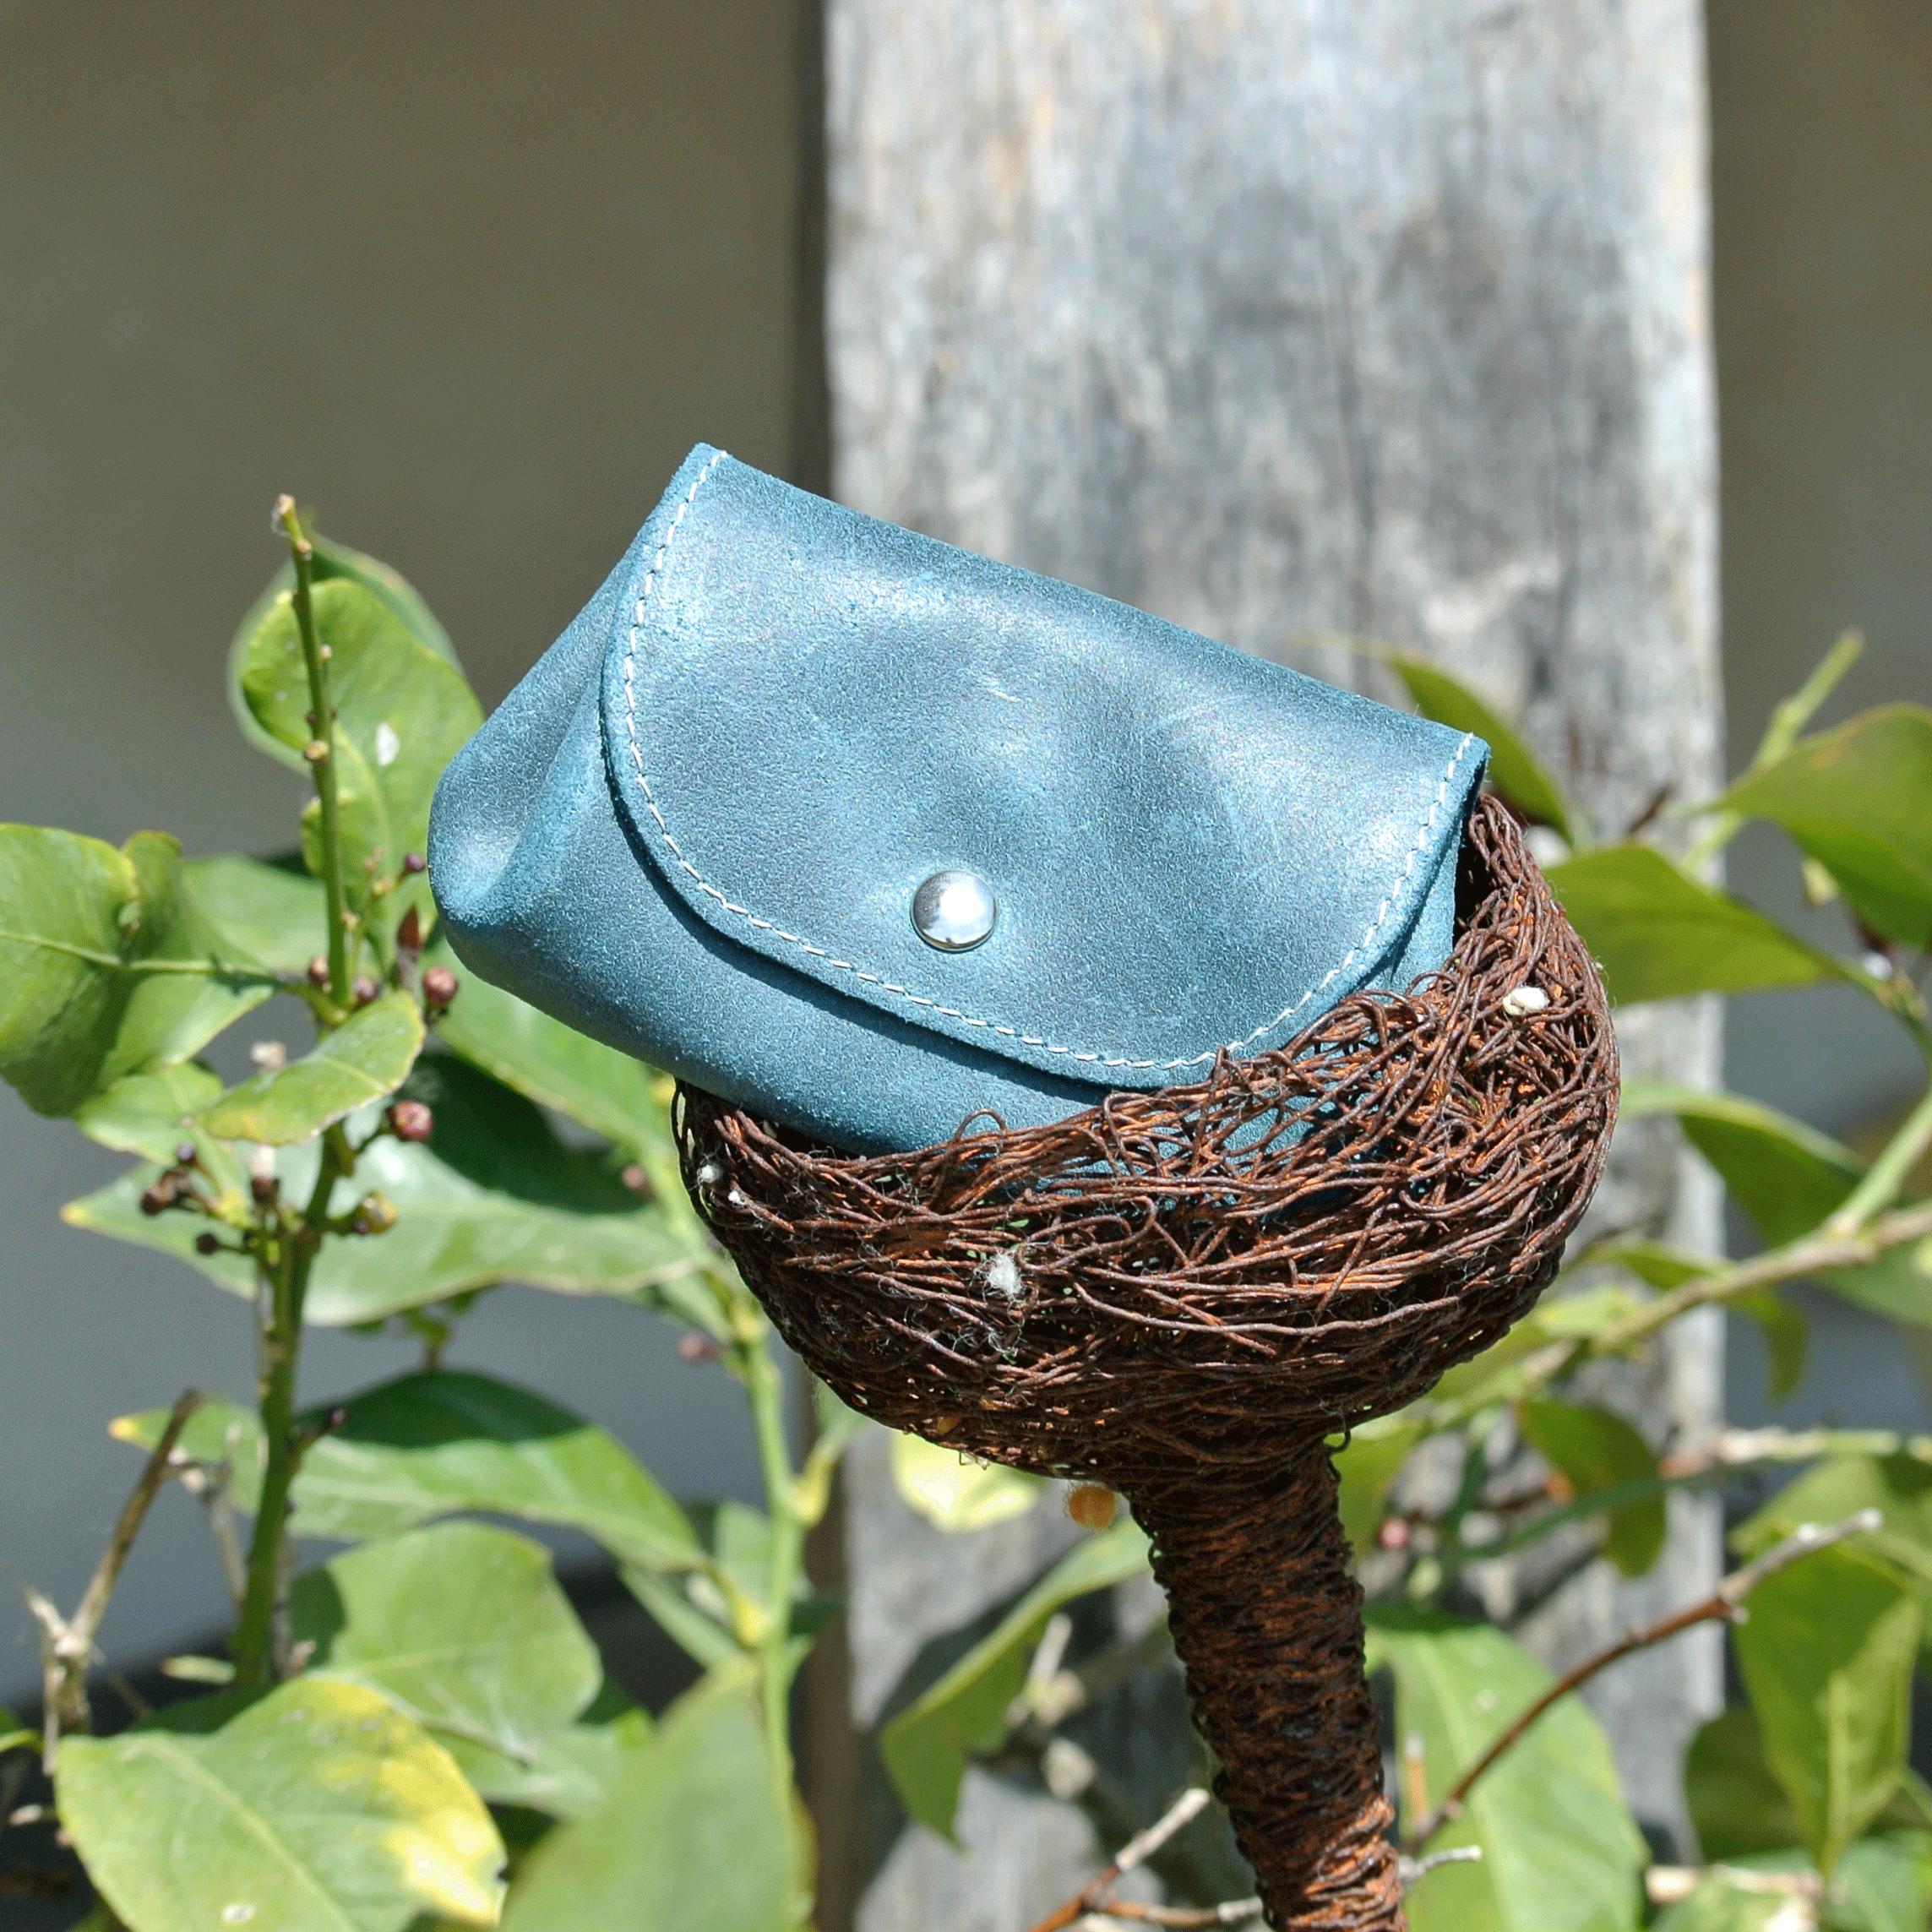 cuirs-fantaisies-la-cartabliere-fabrique-en-france-porte-monnaie-accordeon-en-cuir-retro-bleu-paon